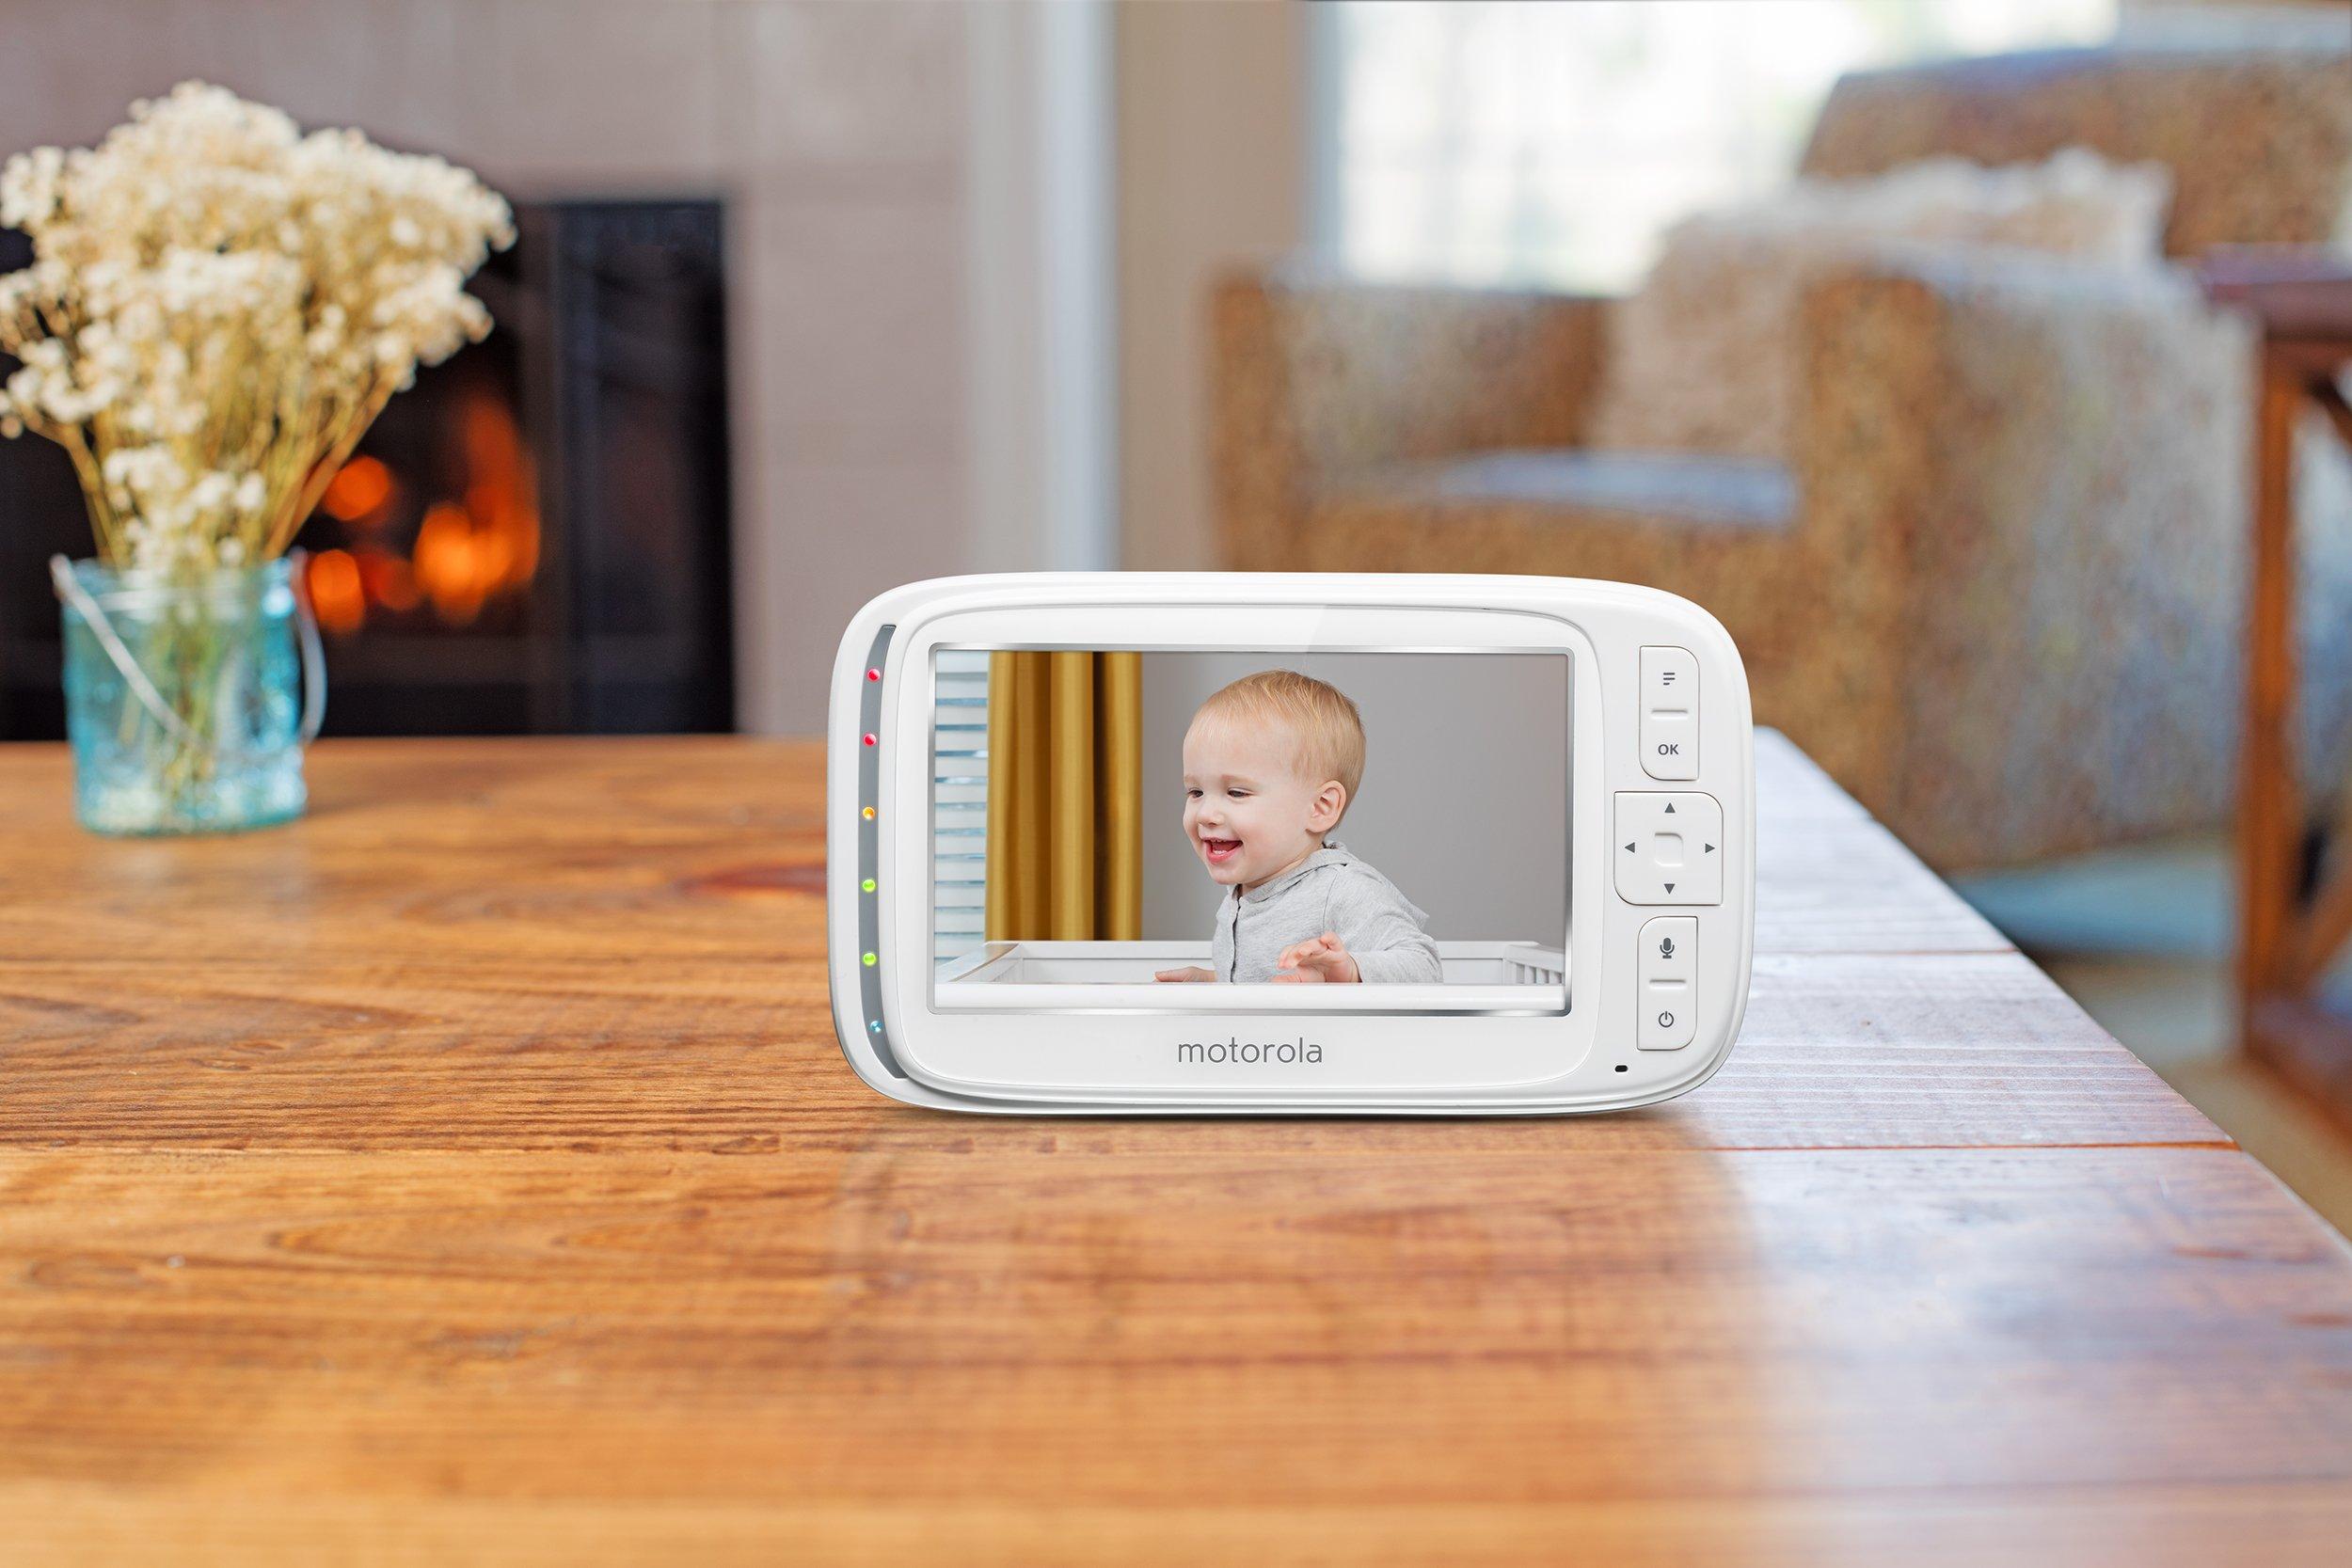 Motorola Comfort 50 Digital Video Audio Baby Monitor with 5 inch Color Screen by Motorola Baby (Image #5)